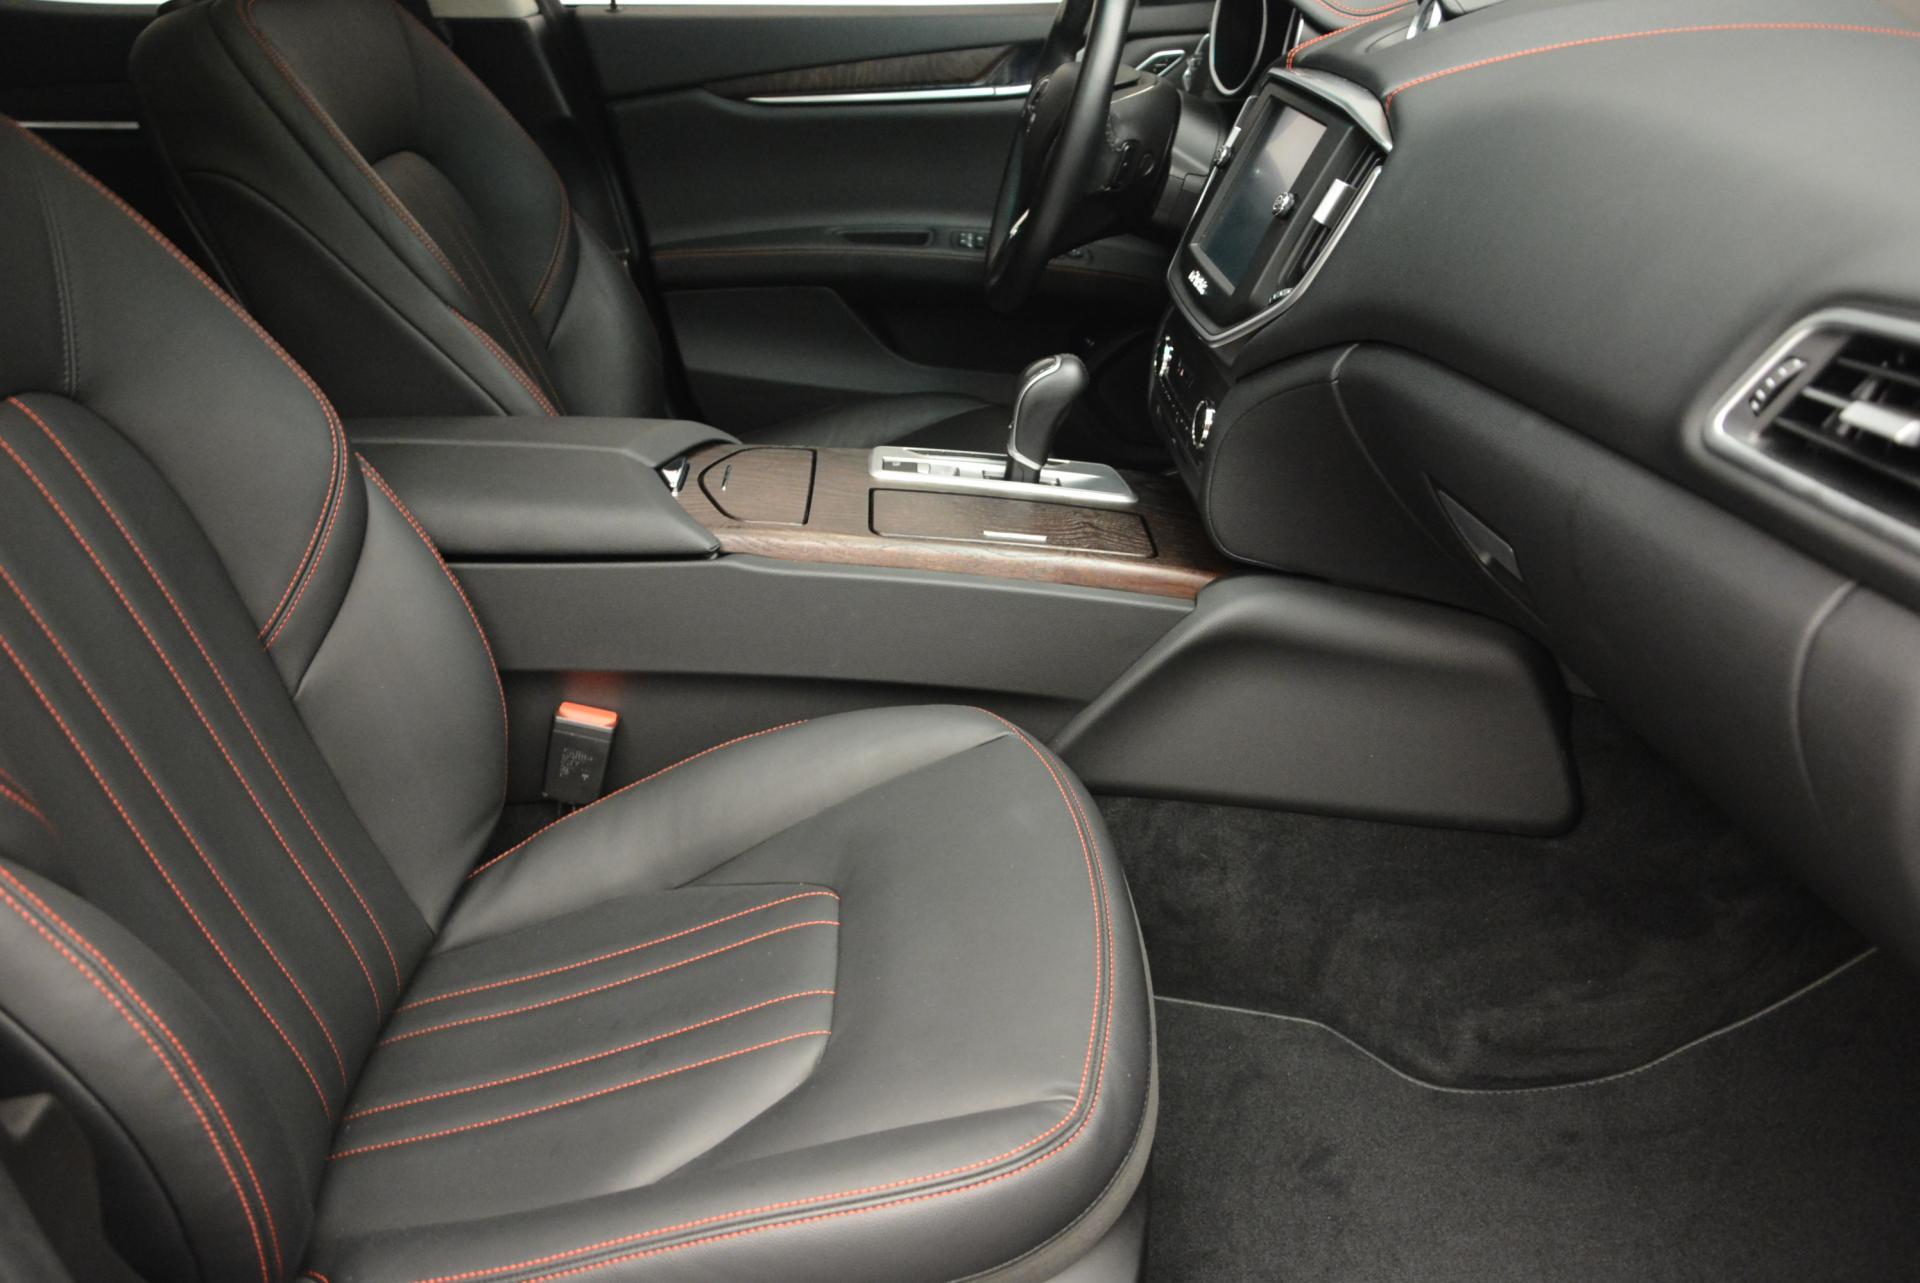 Used 2016 Maserati Ghibli S Q4 For Sale In Westport, CT 192_p14